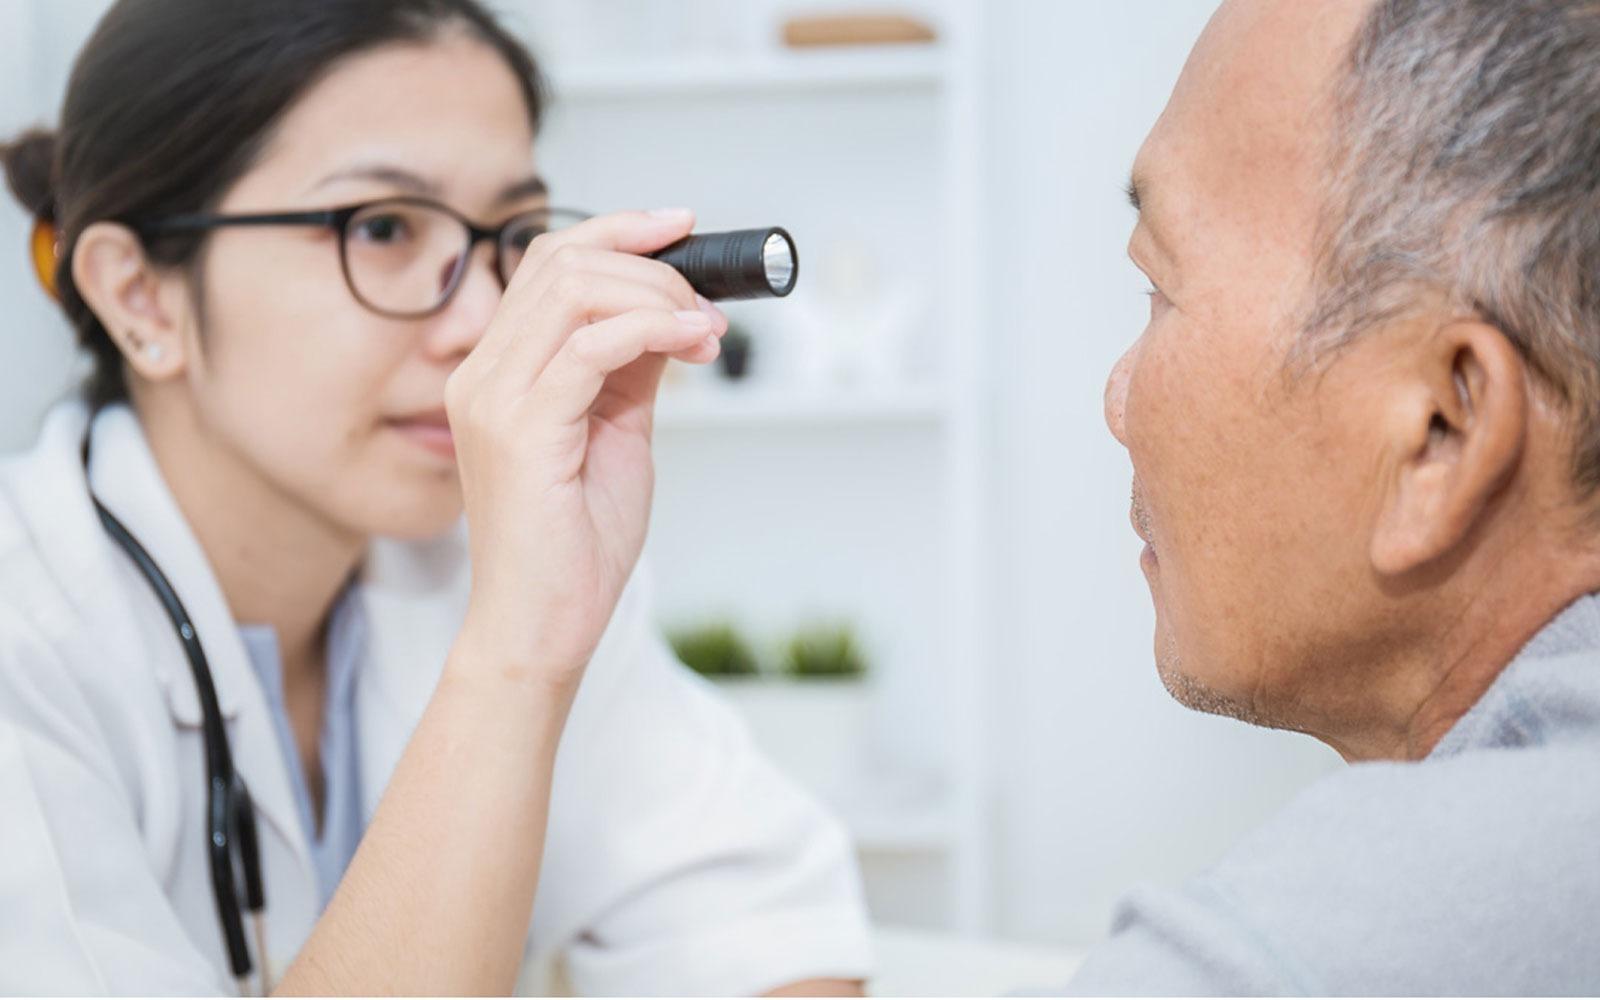 Cara Mengatasi Gangguan Penglihatan akibat Komplikasi Diabetes